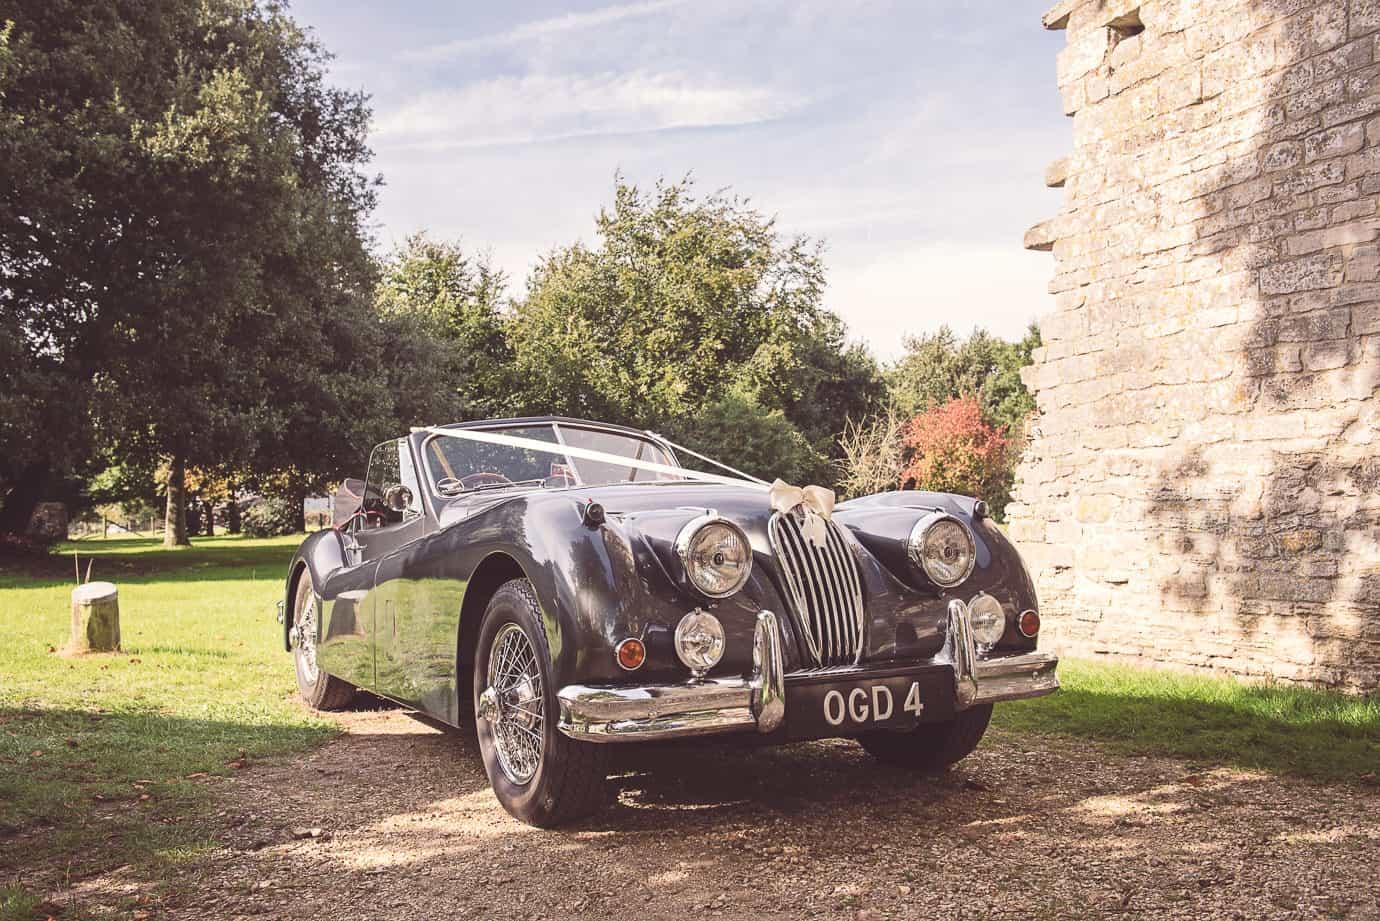 Classic Jaguar wedding car photo by Lulworth Castle wedding photographers